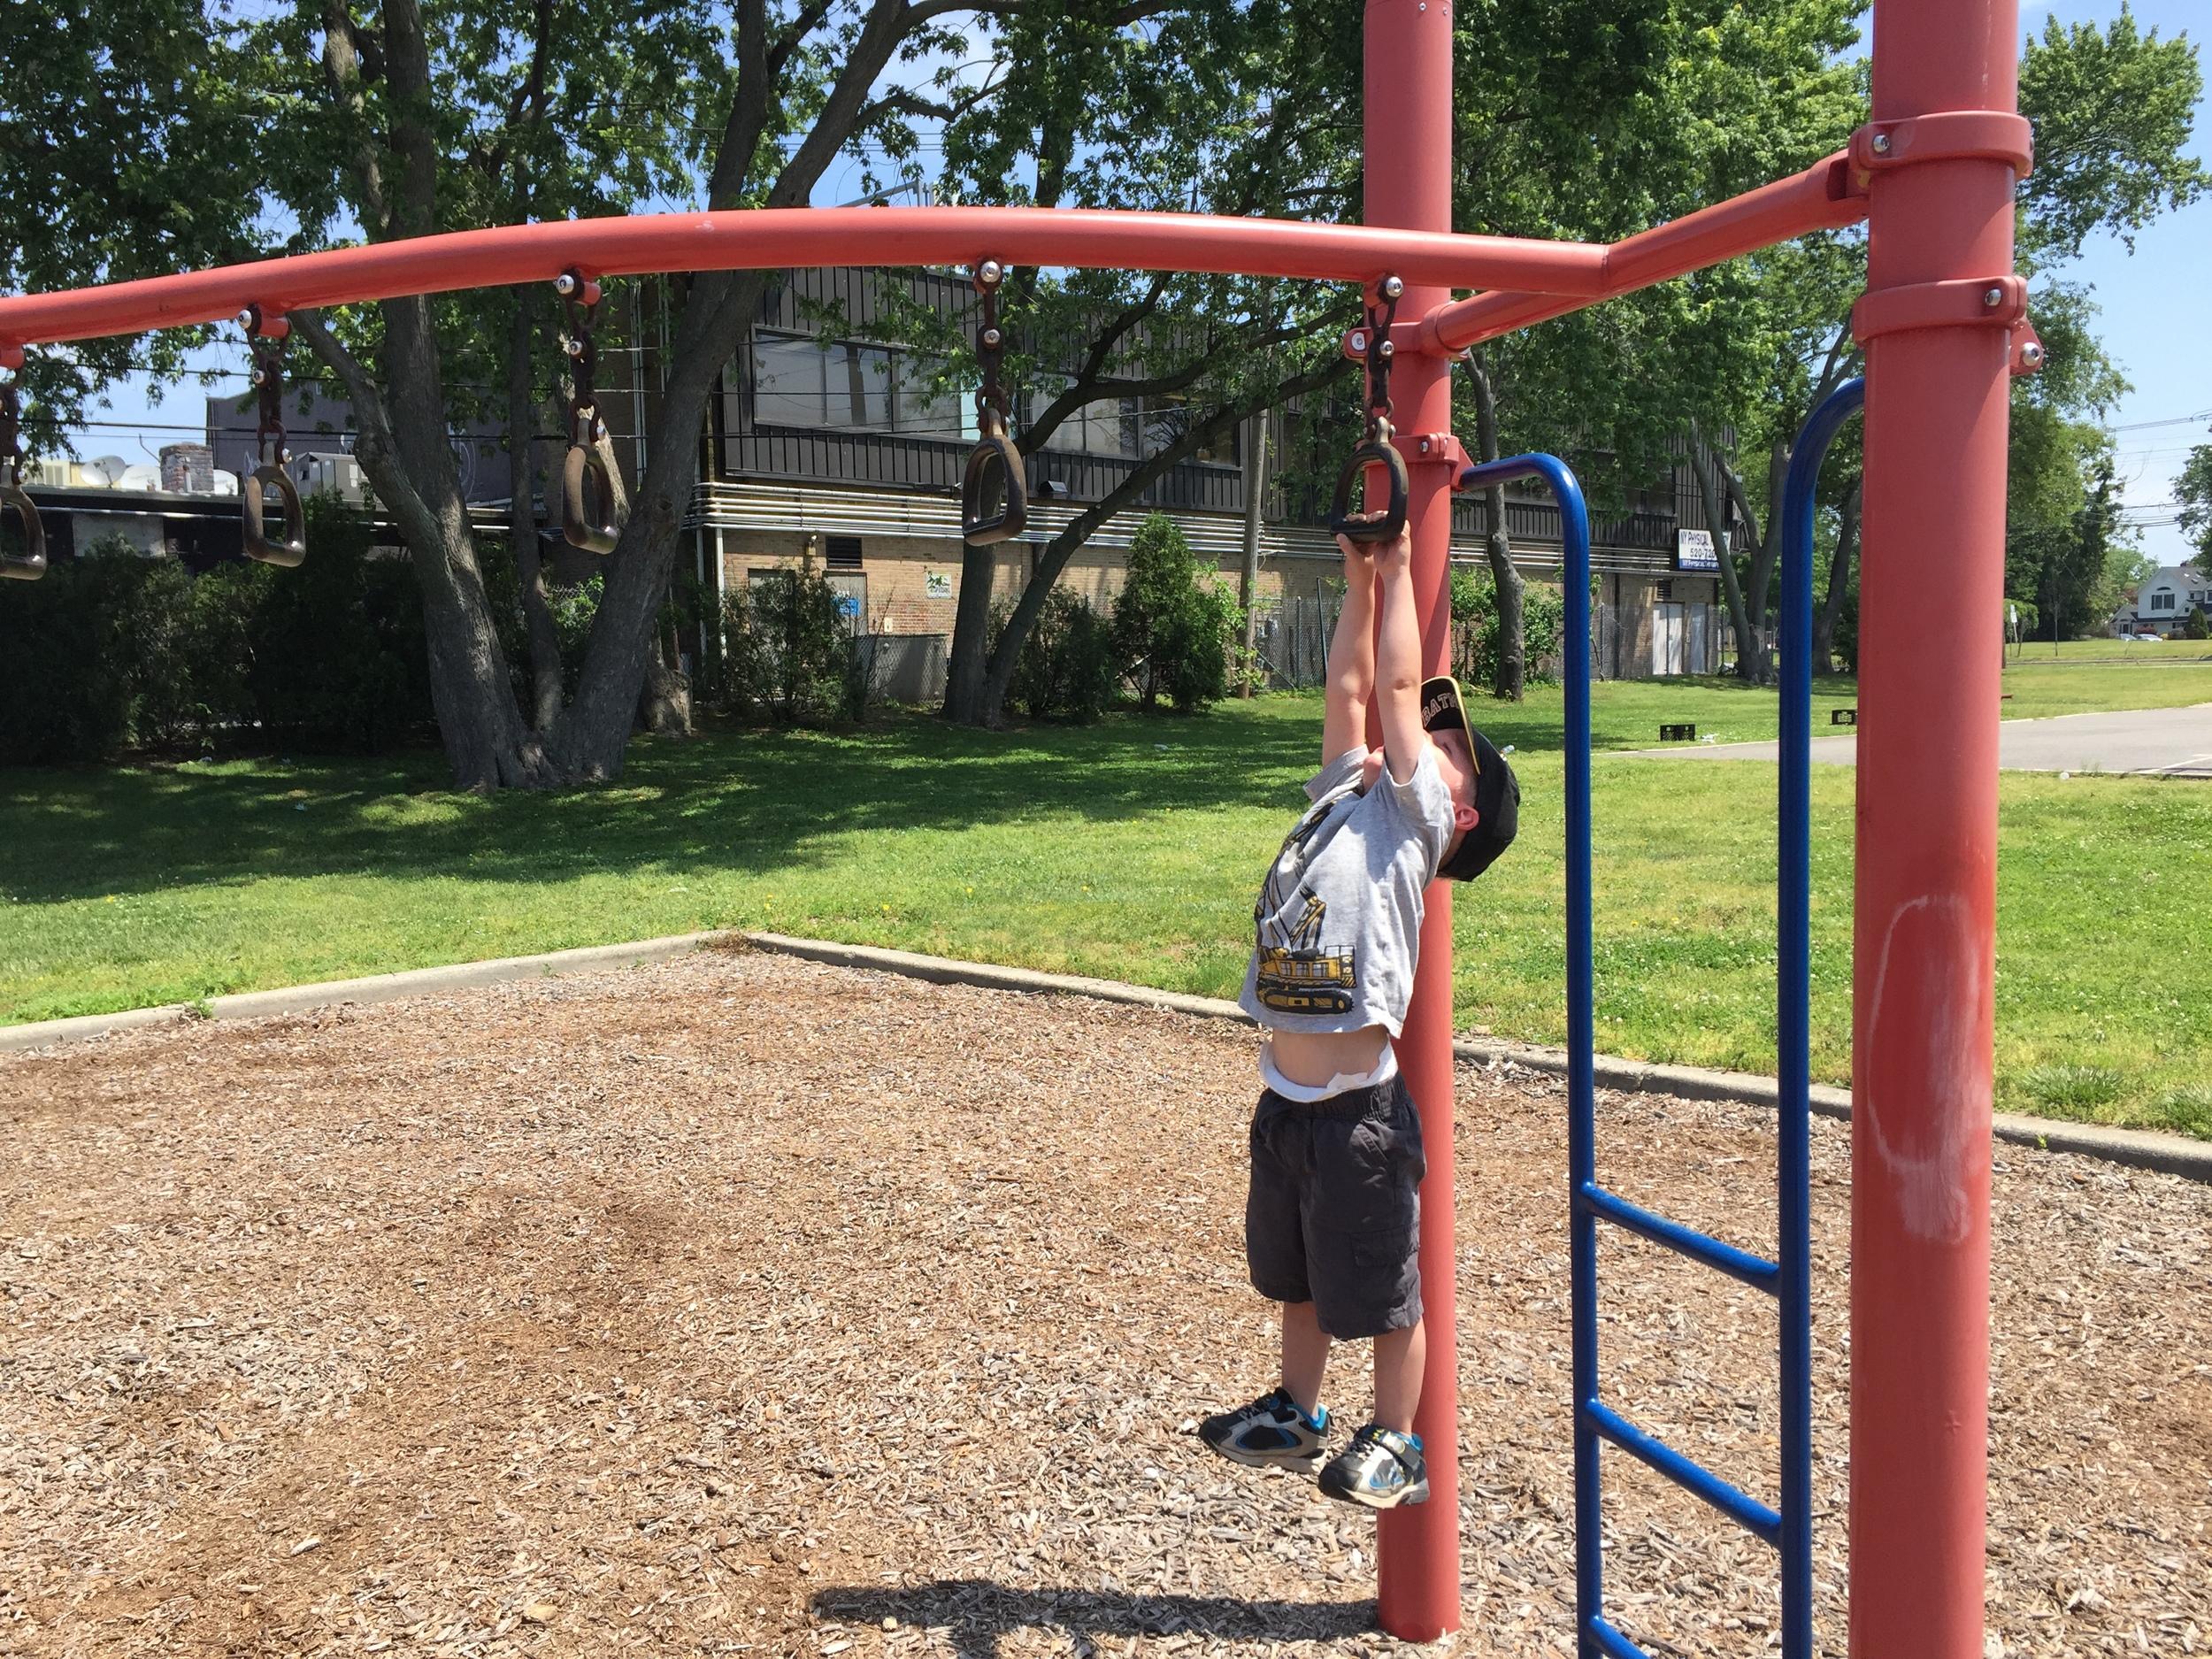 Playground at Benoit Park